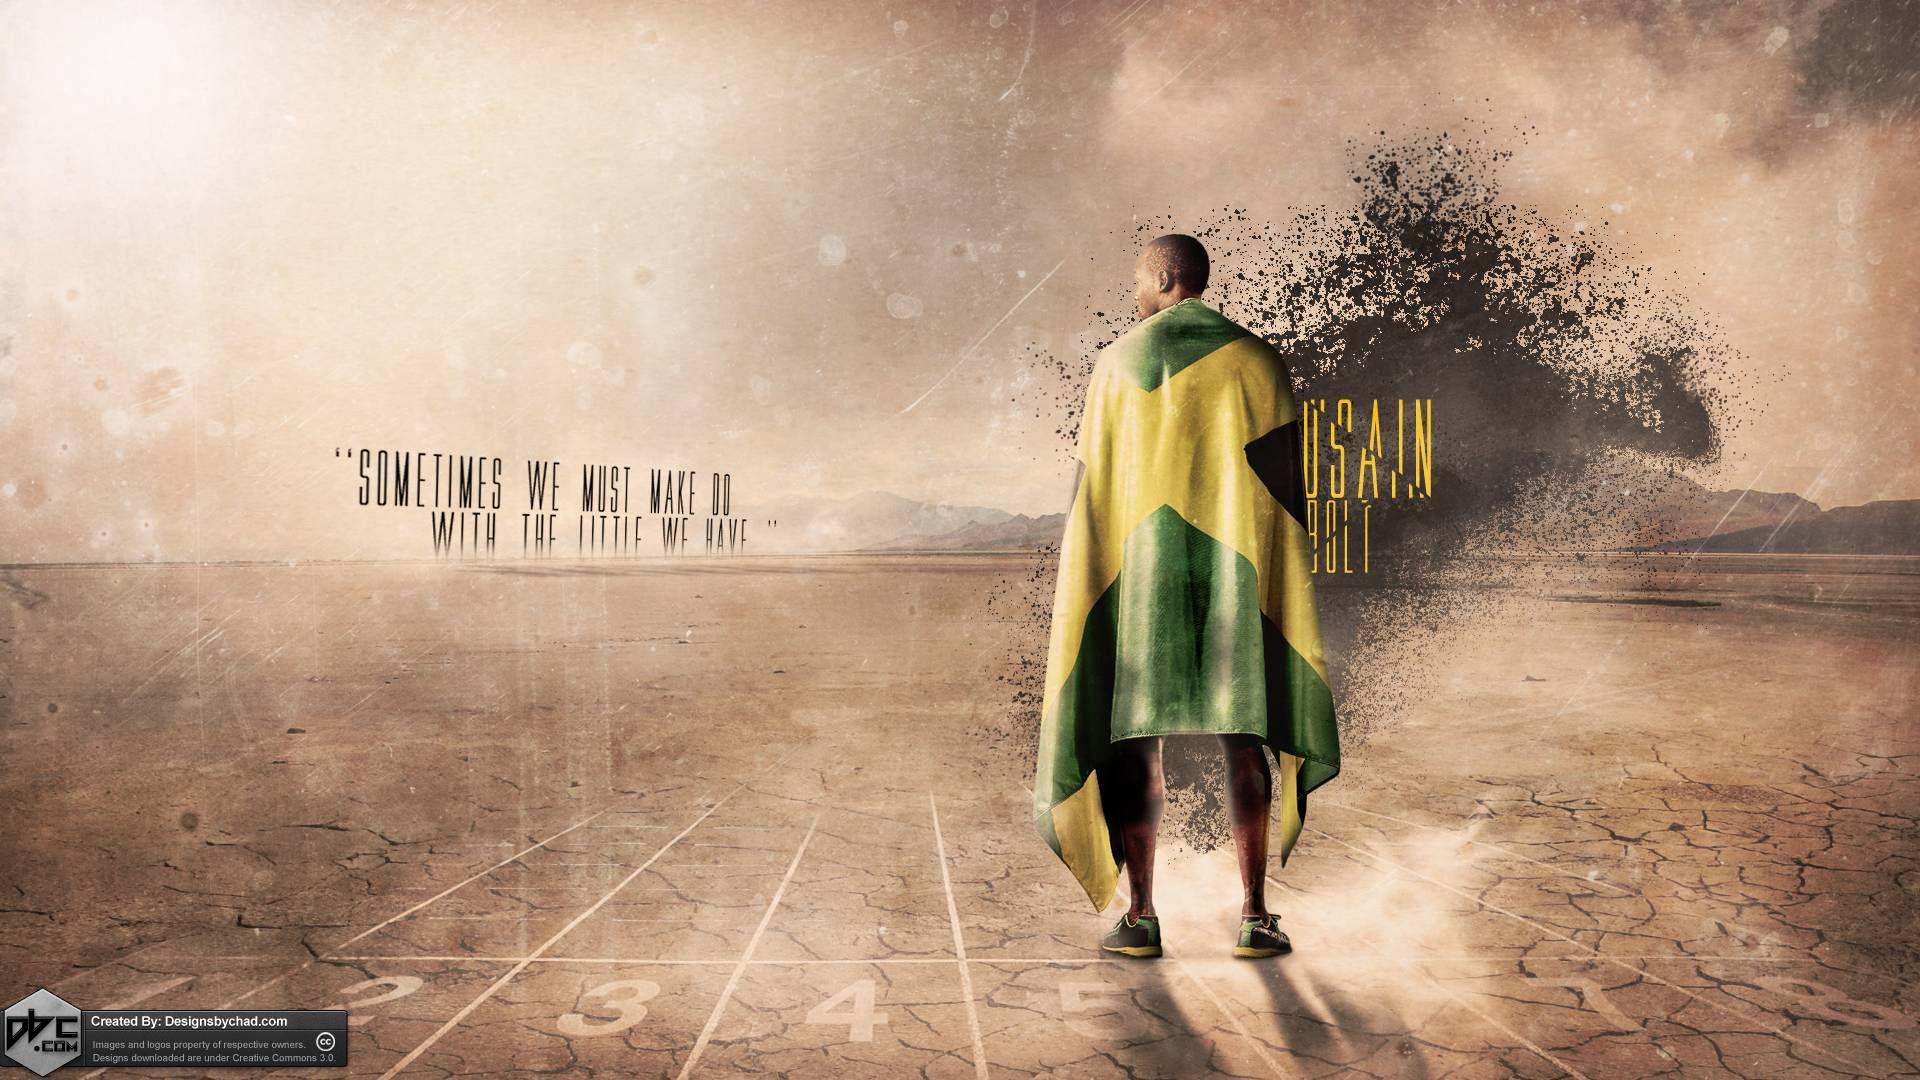 Usain Bolt Quotes Wallpaper